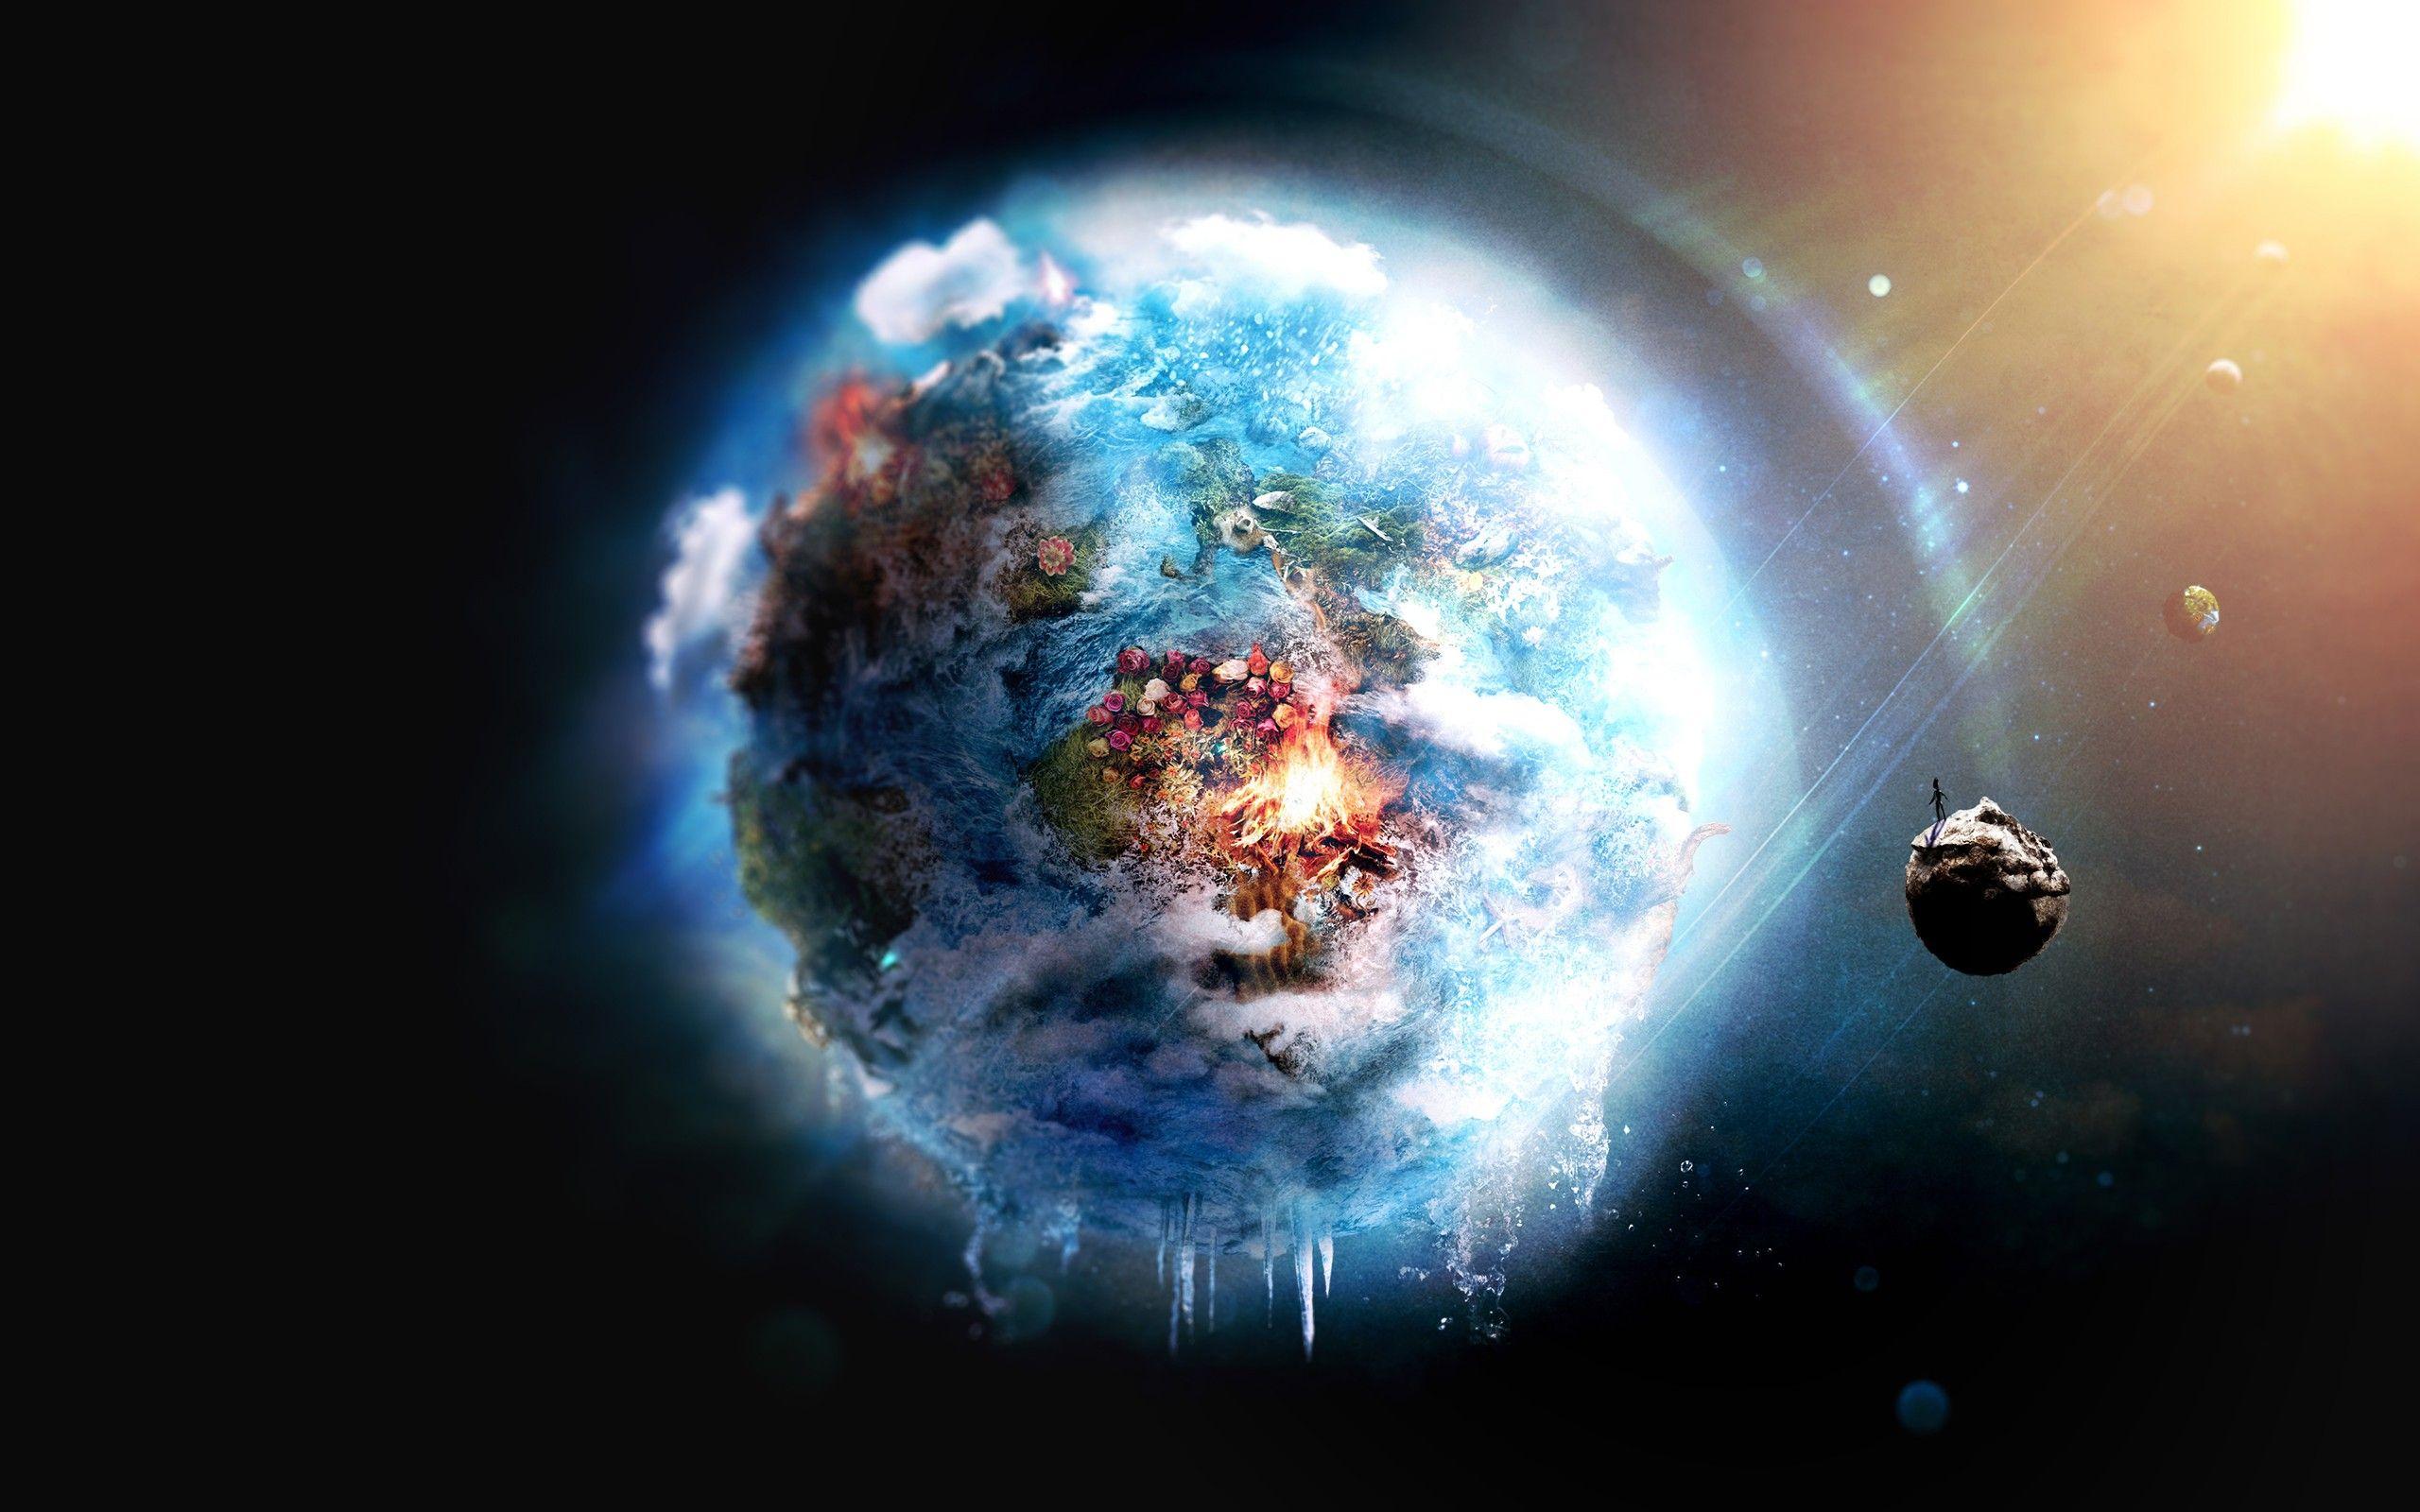 #Earth, #Futuristic, #Digital Art, #Space - Wallpaper No 5333